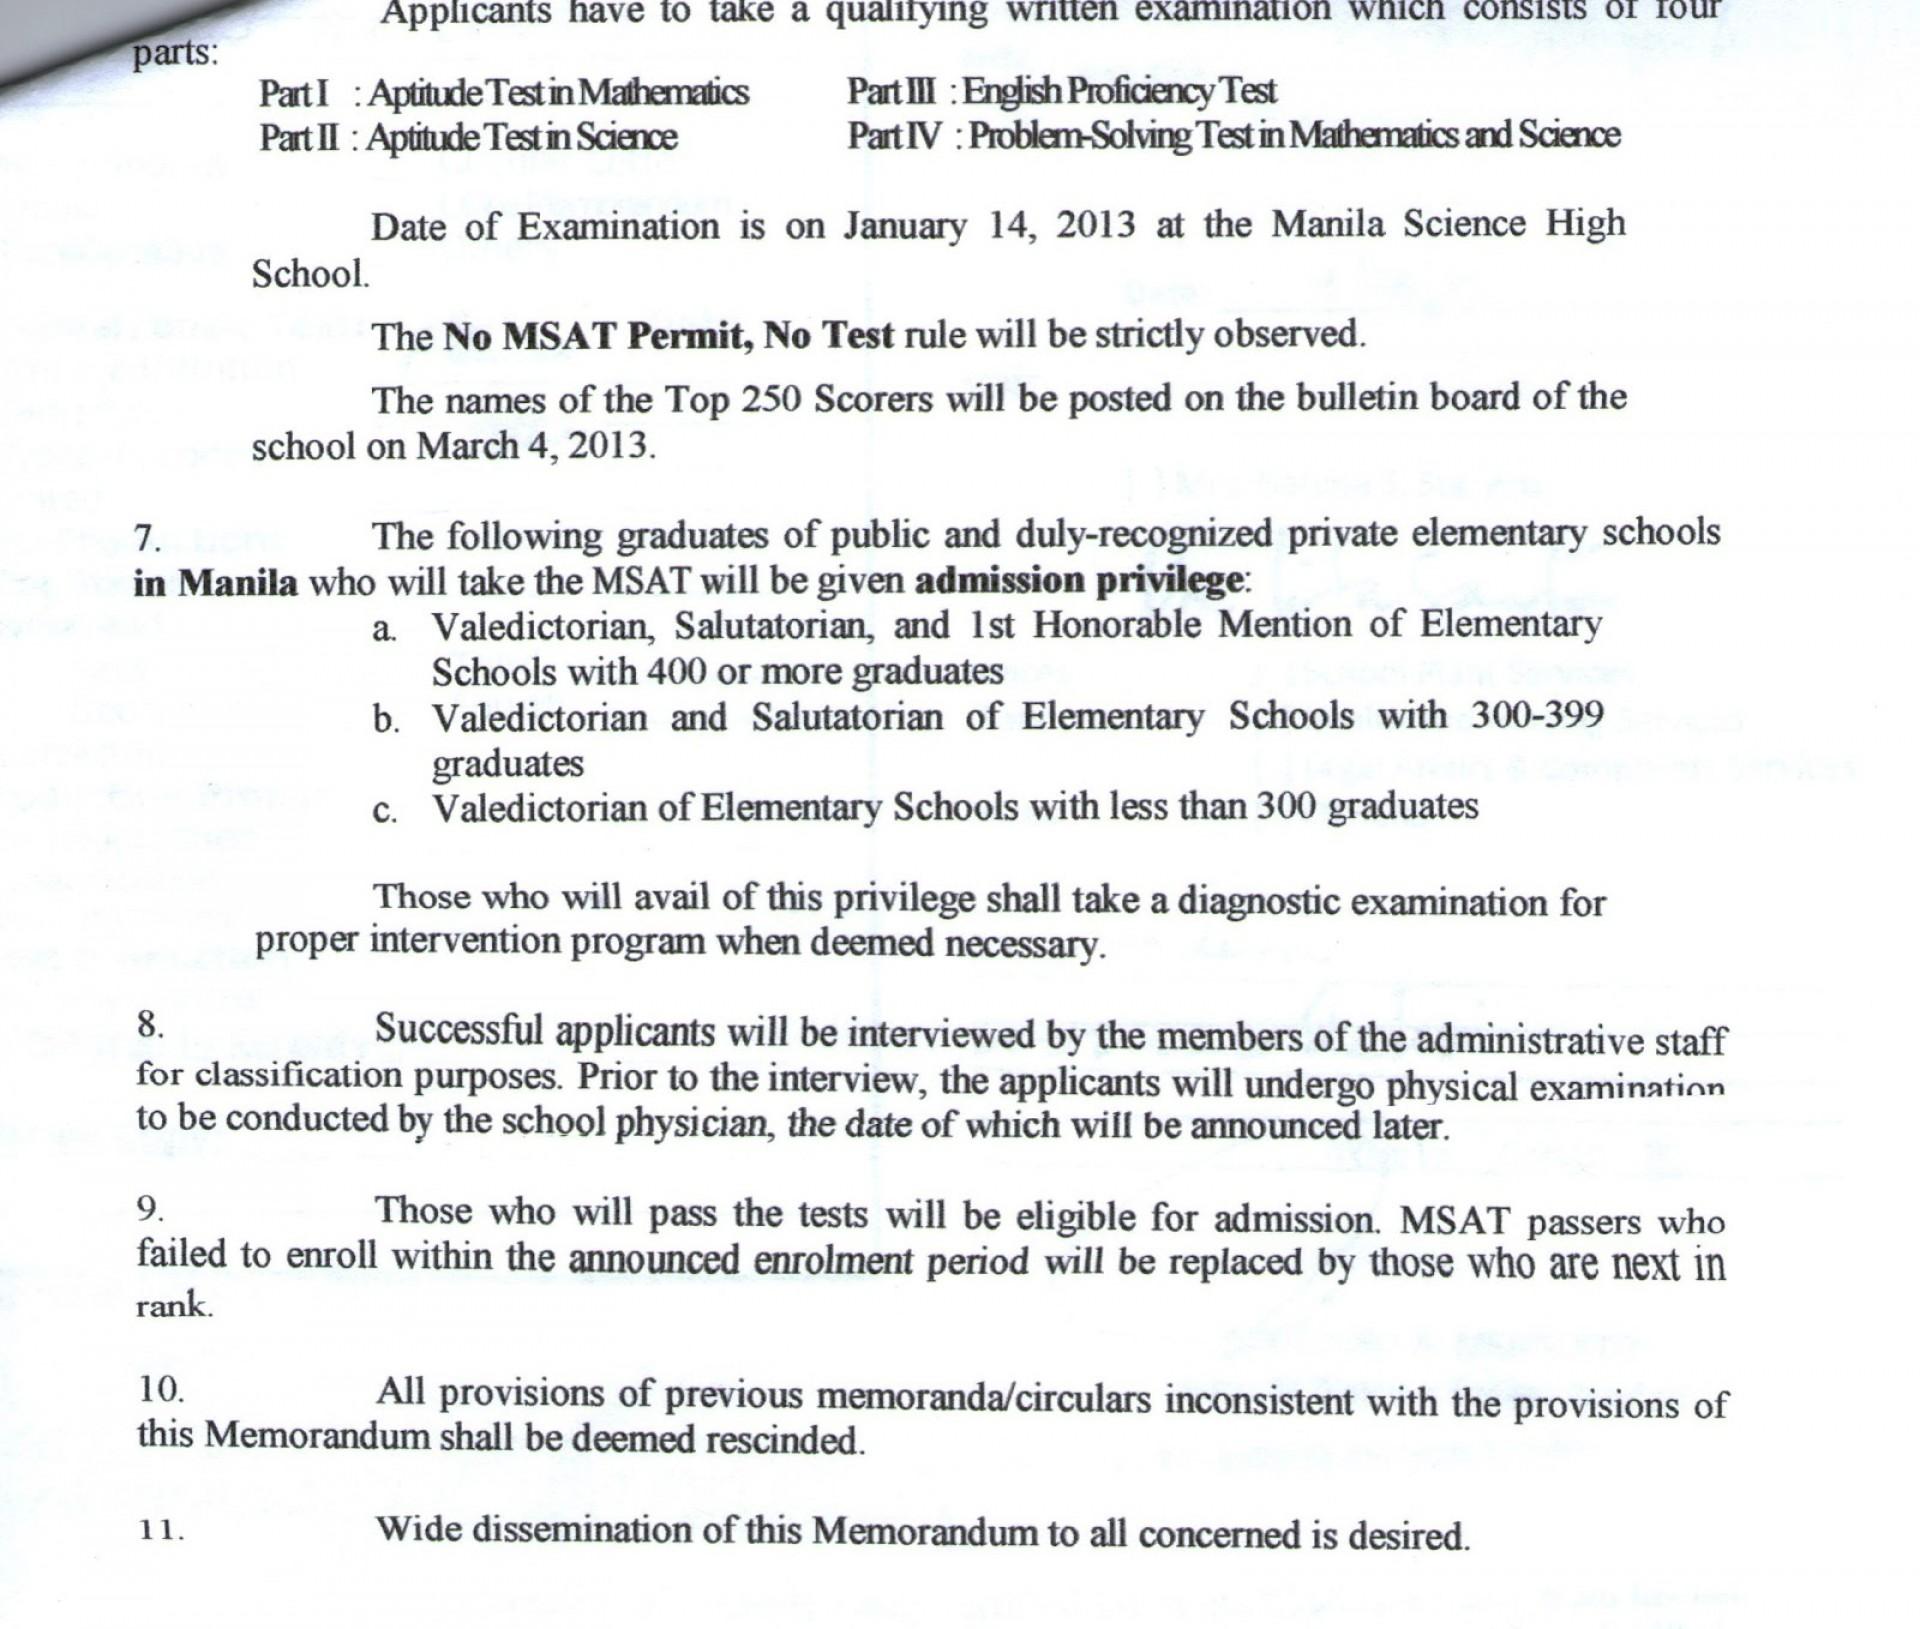 018 Msat002 Essay Example Scholarship Amazing Topics Prompts 2017 2016 Question Paper 2018 Class 5 1920